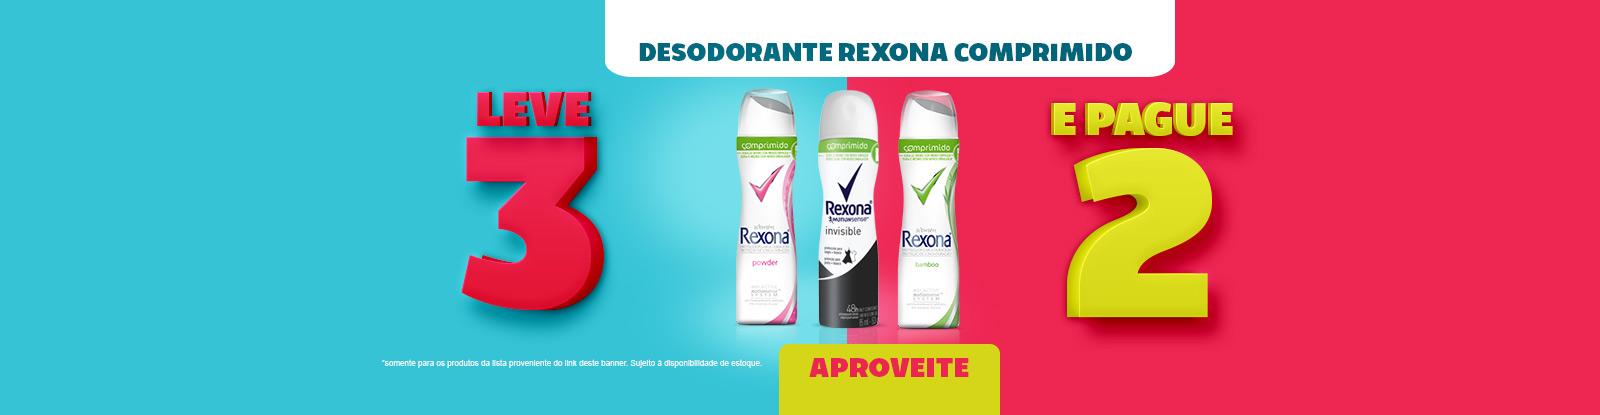 desodorante rexona